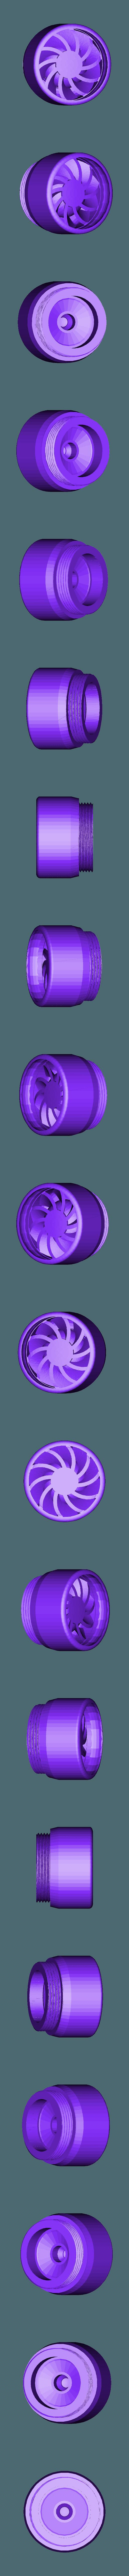 Turbine_Watersaver.stl Download free STL file Turbine Faucet Watersaver • 3D printable template, madsoul666